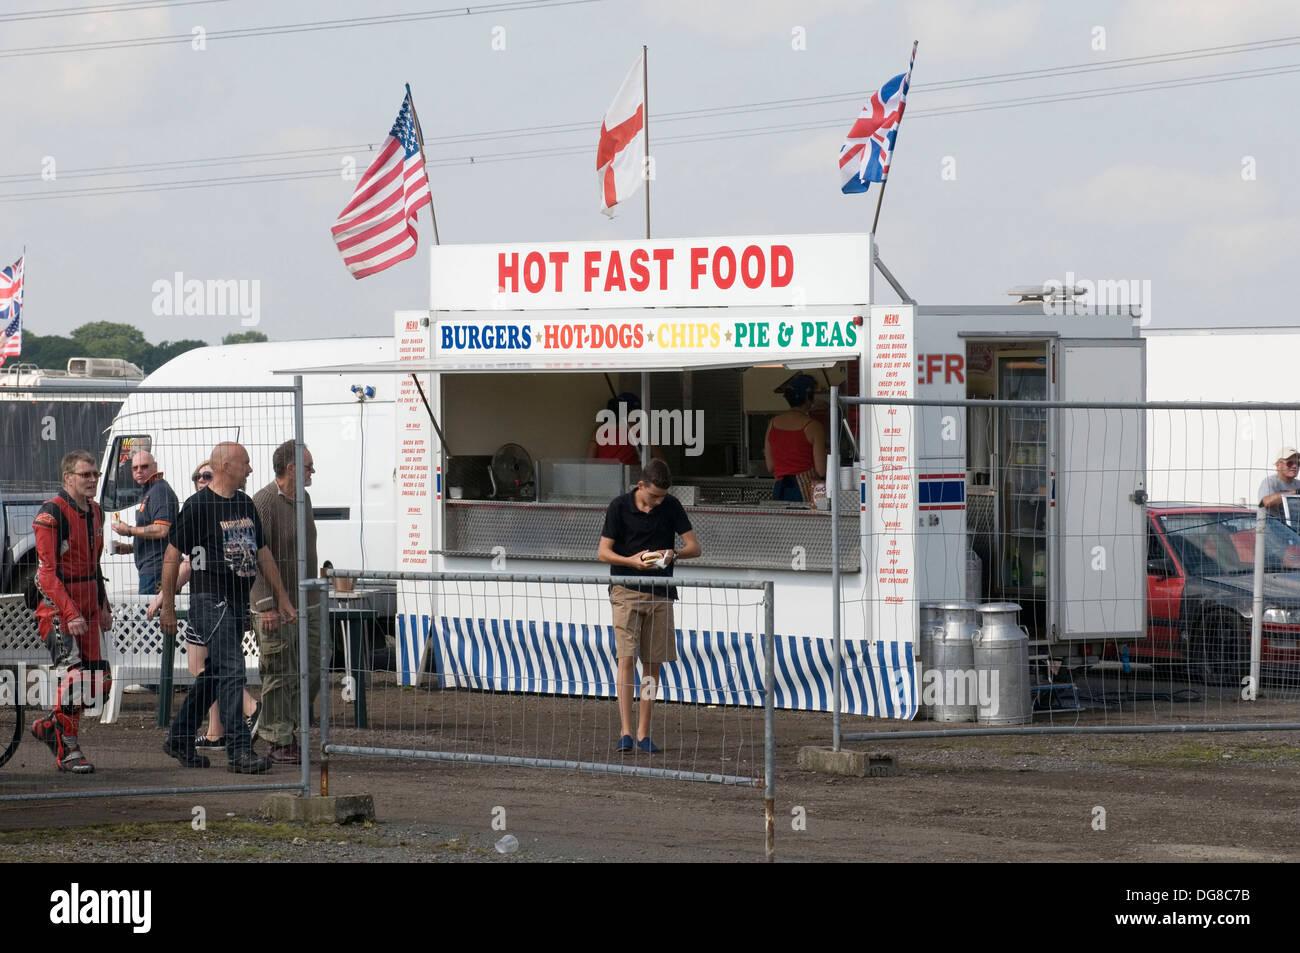 burger van vans fast food trailer food wagon hot catering outdoor burgers event events - Stock Image